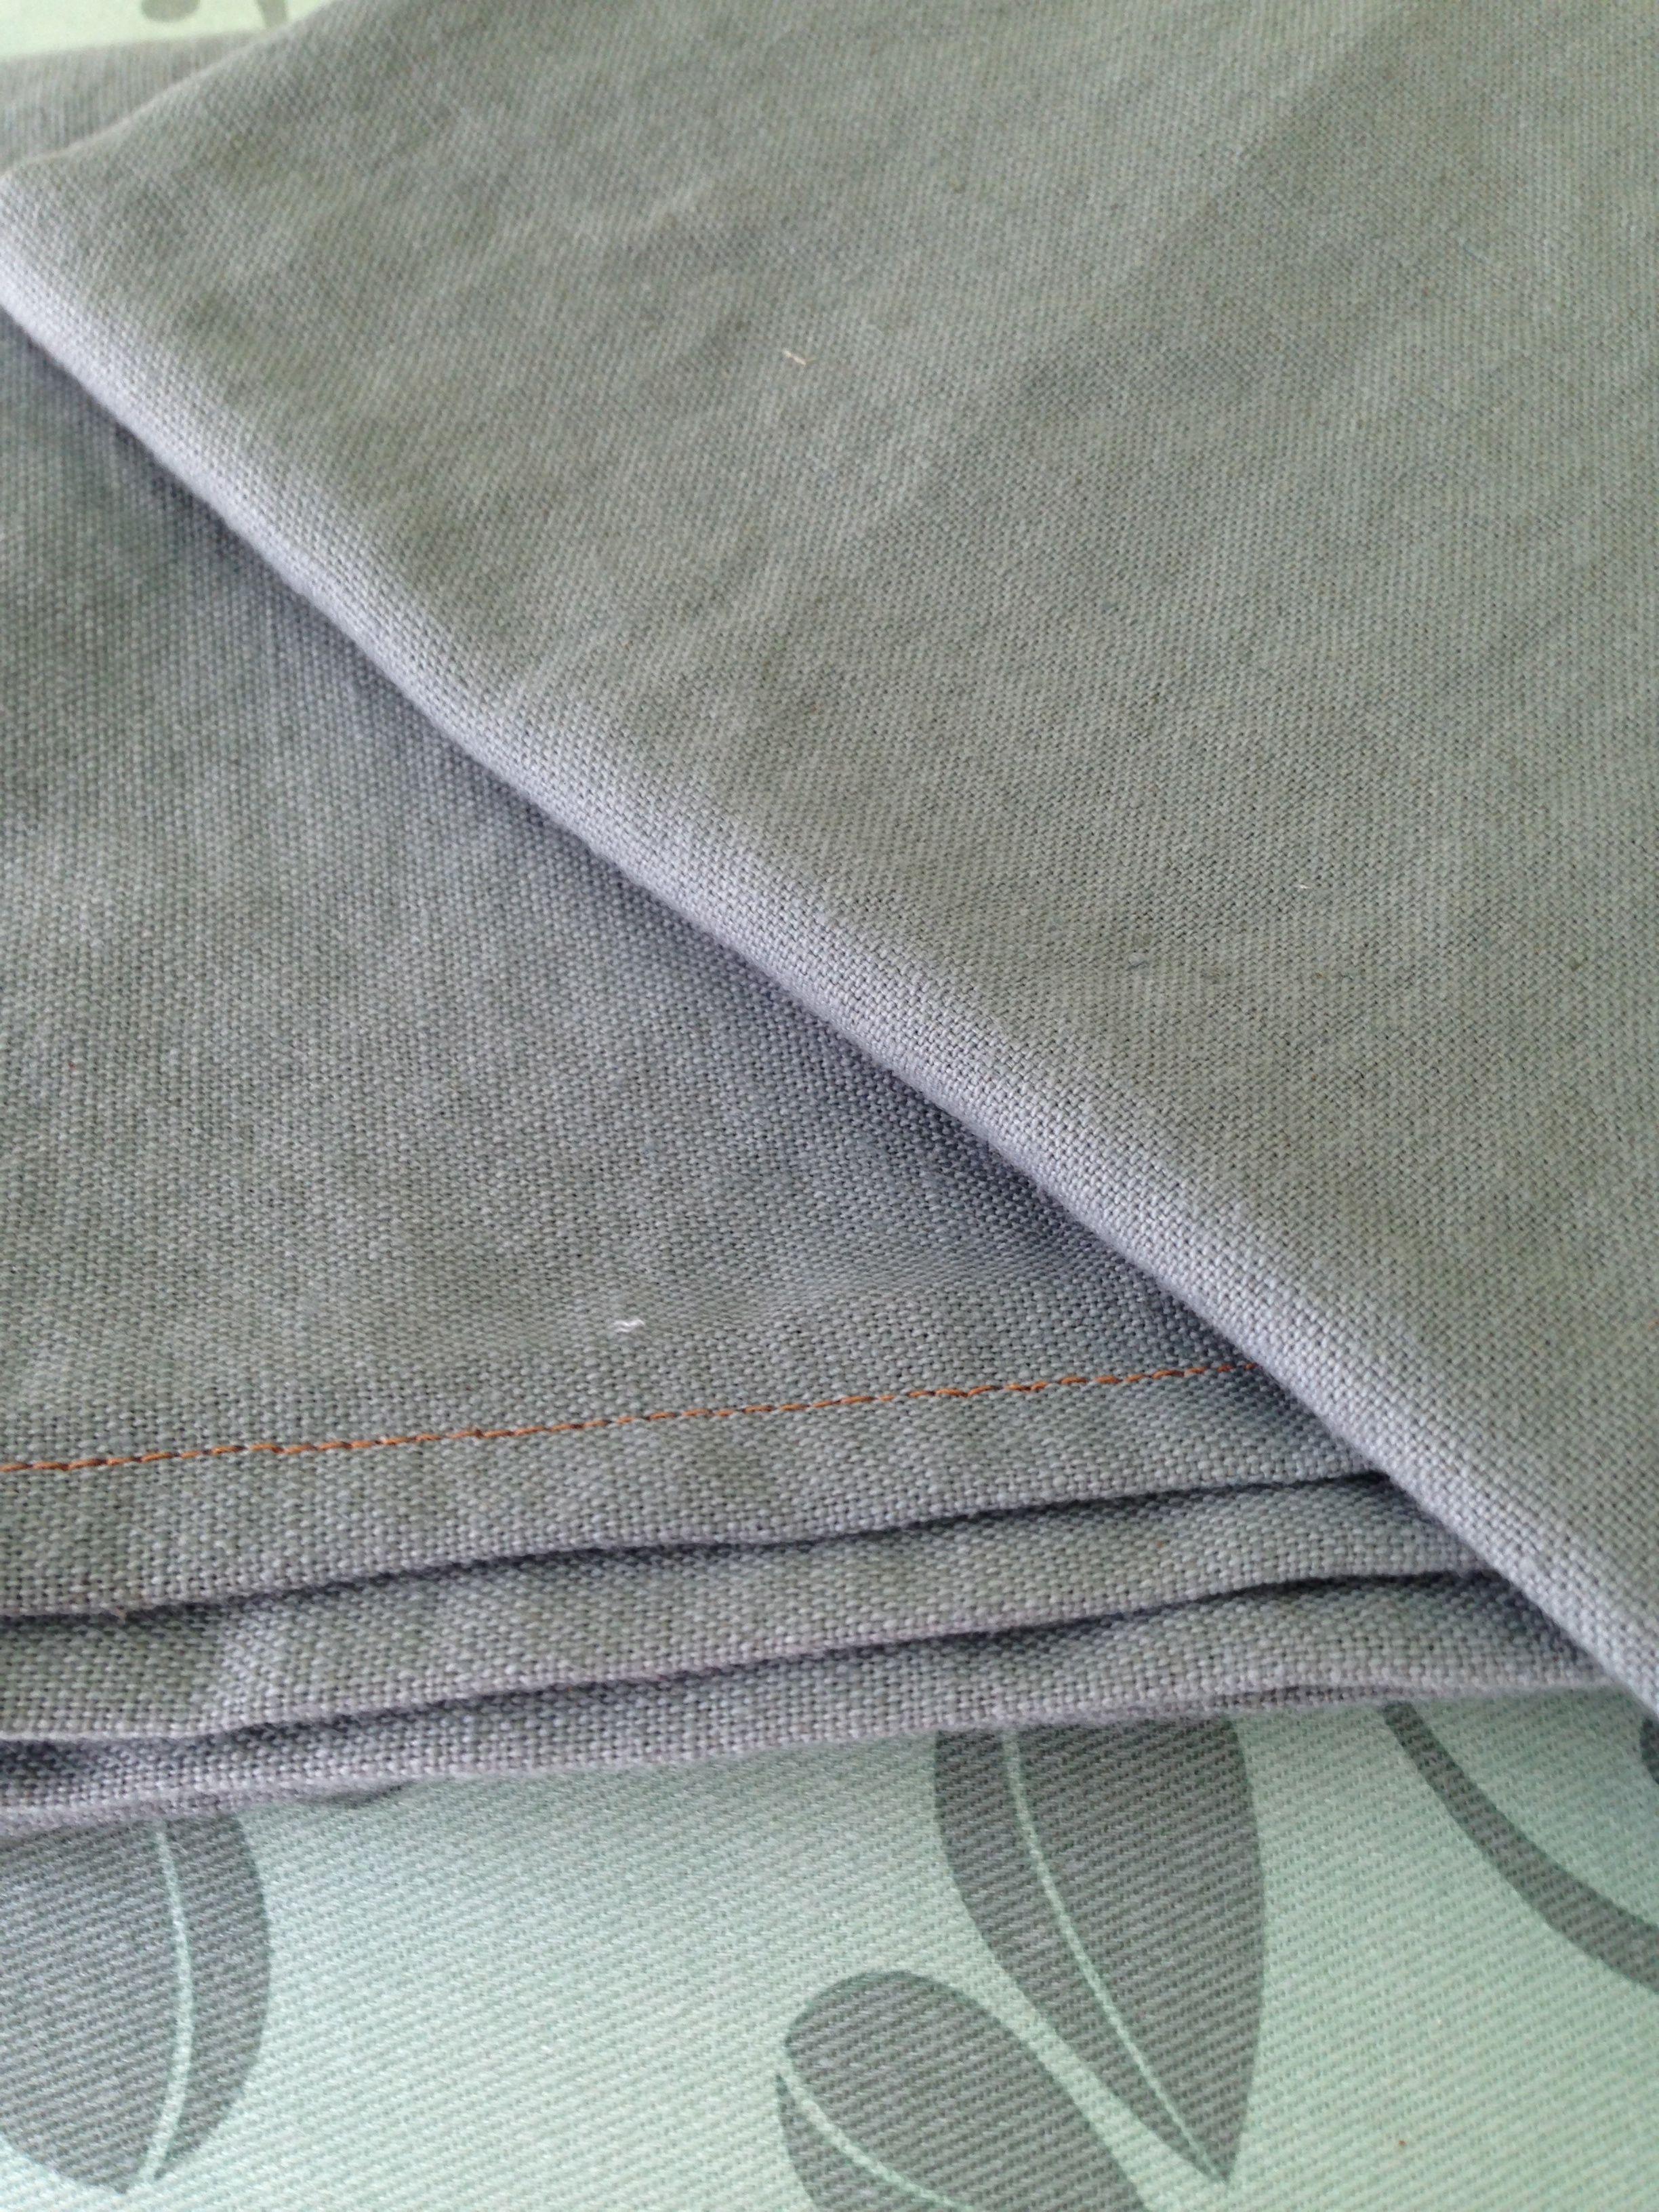 Sewing Your Own Linen Bath Towels Sew Bath Towels Towel Linen